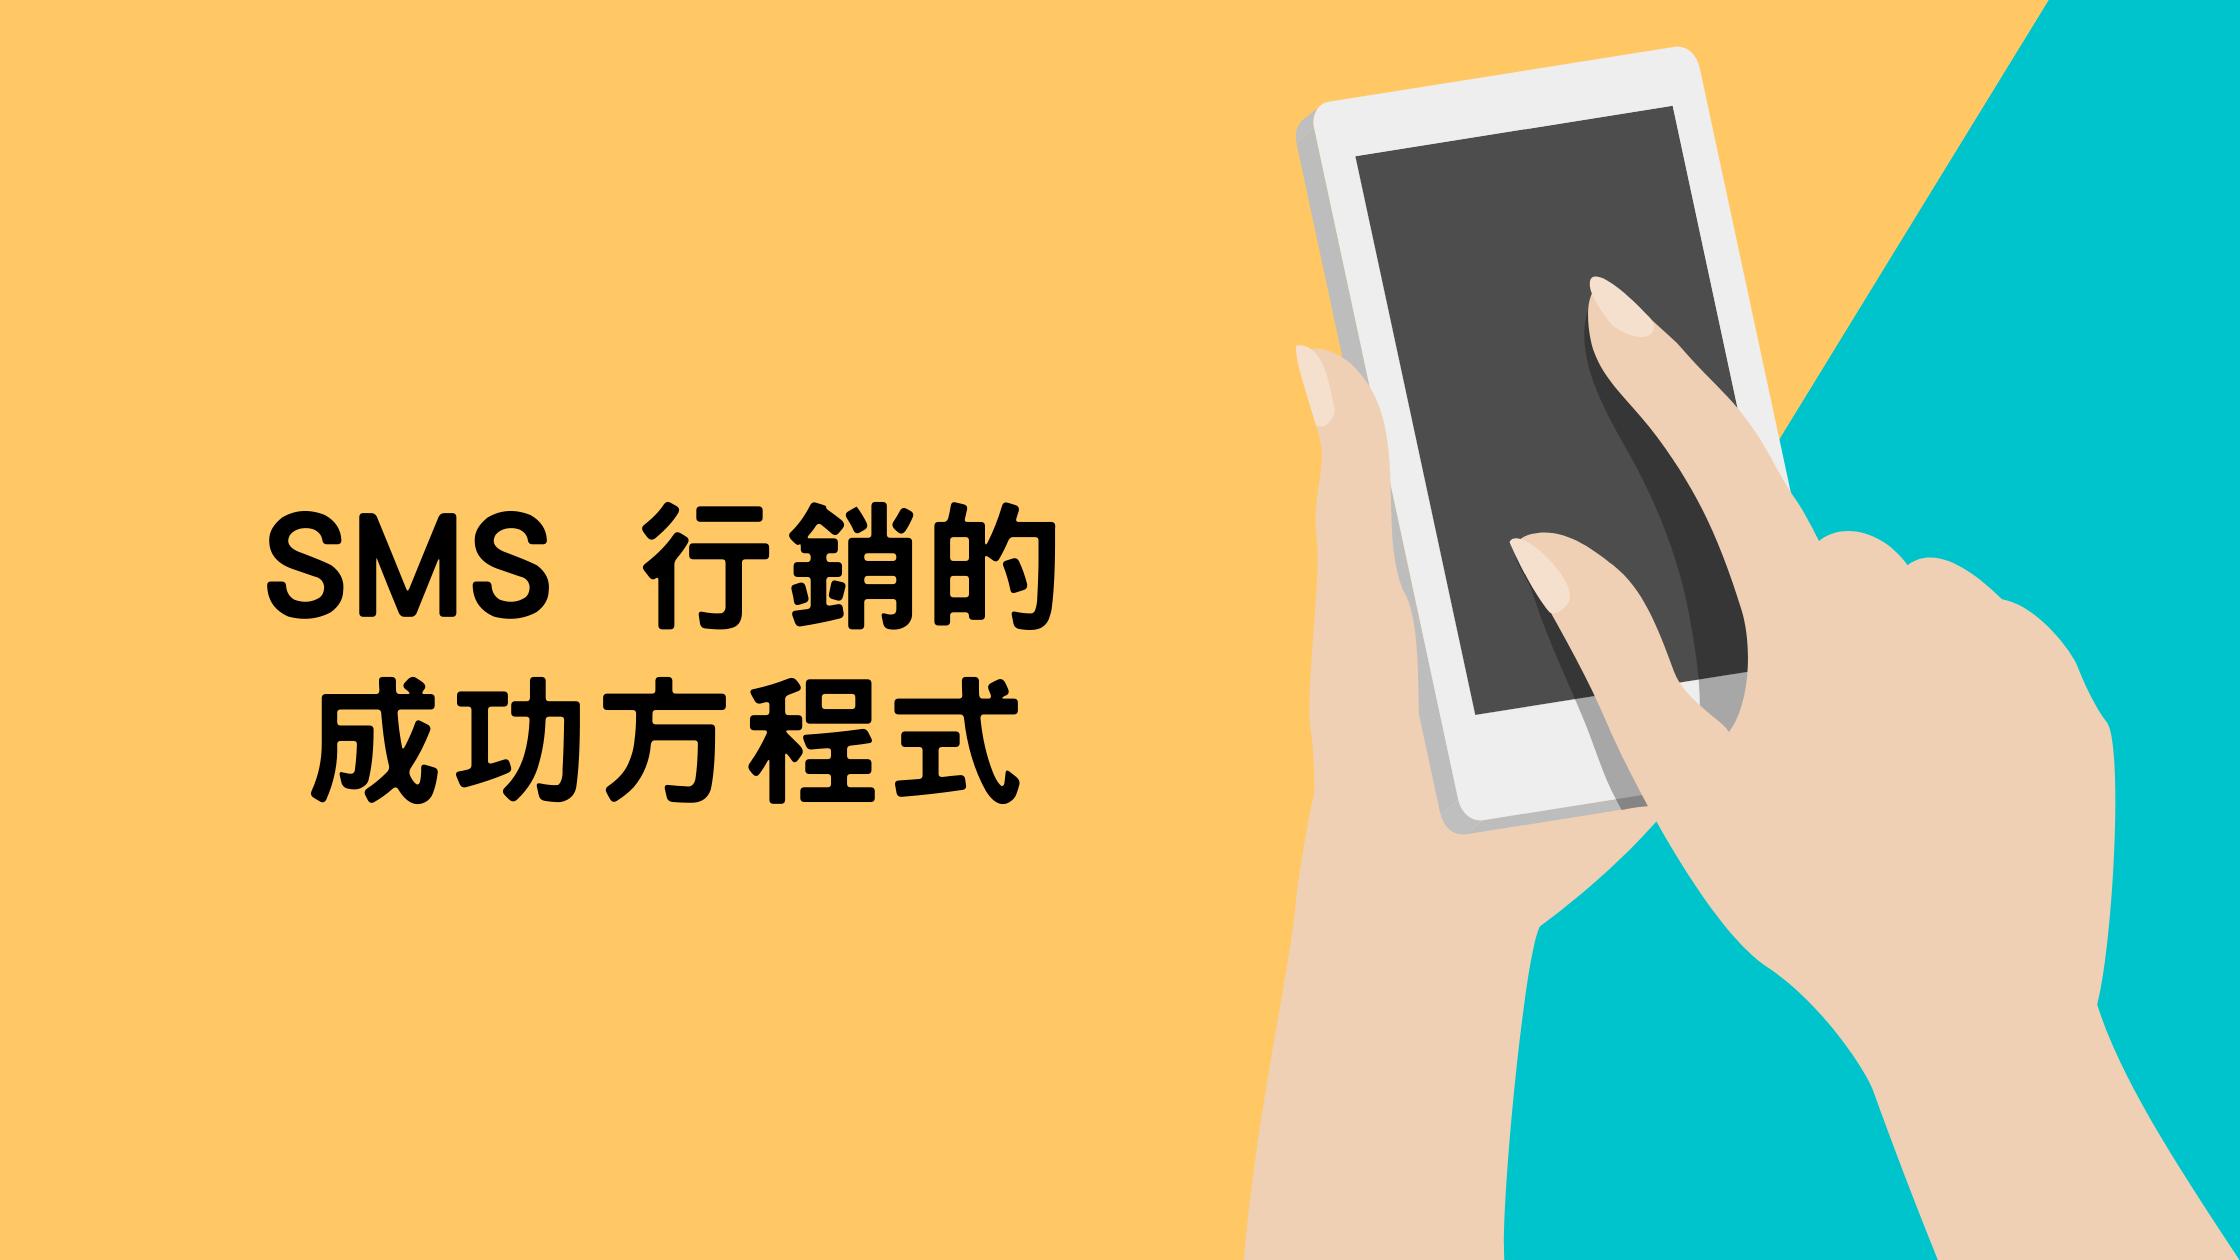 SMS 行銷的成功方程式